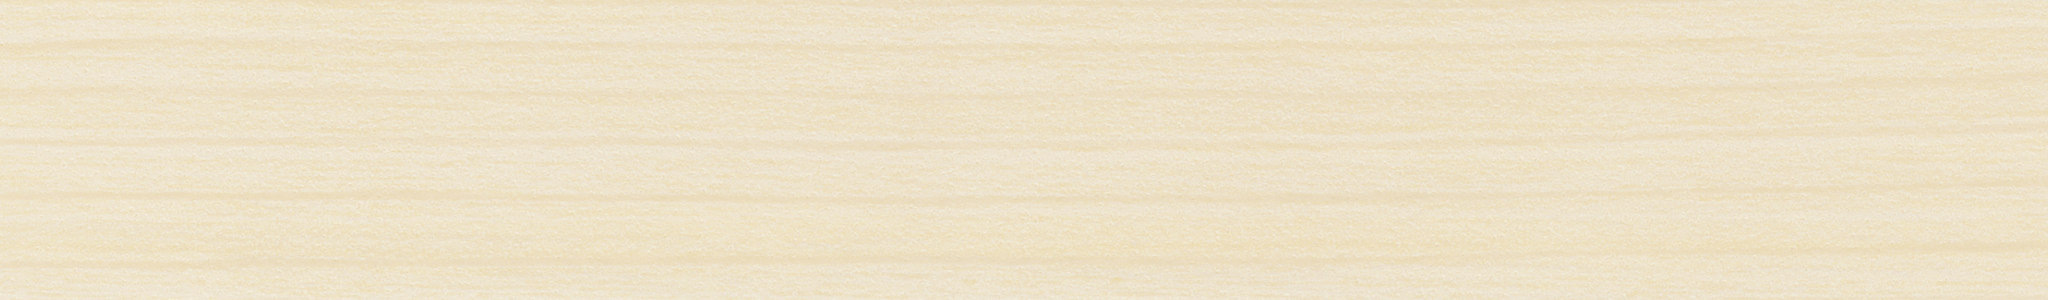 HD 265243 ABS Kante Dekor Ahorn Imperial perl